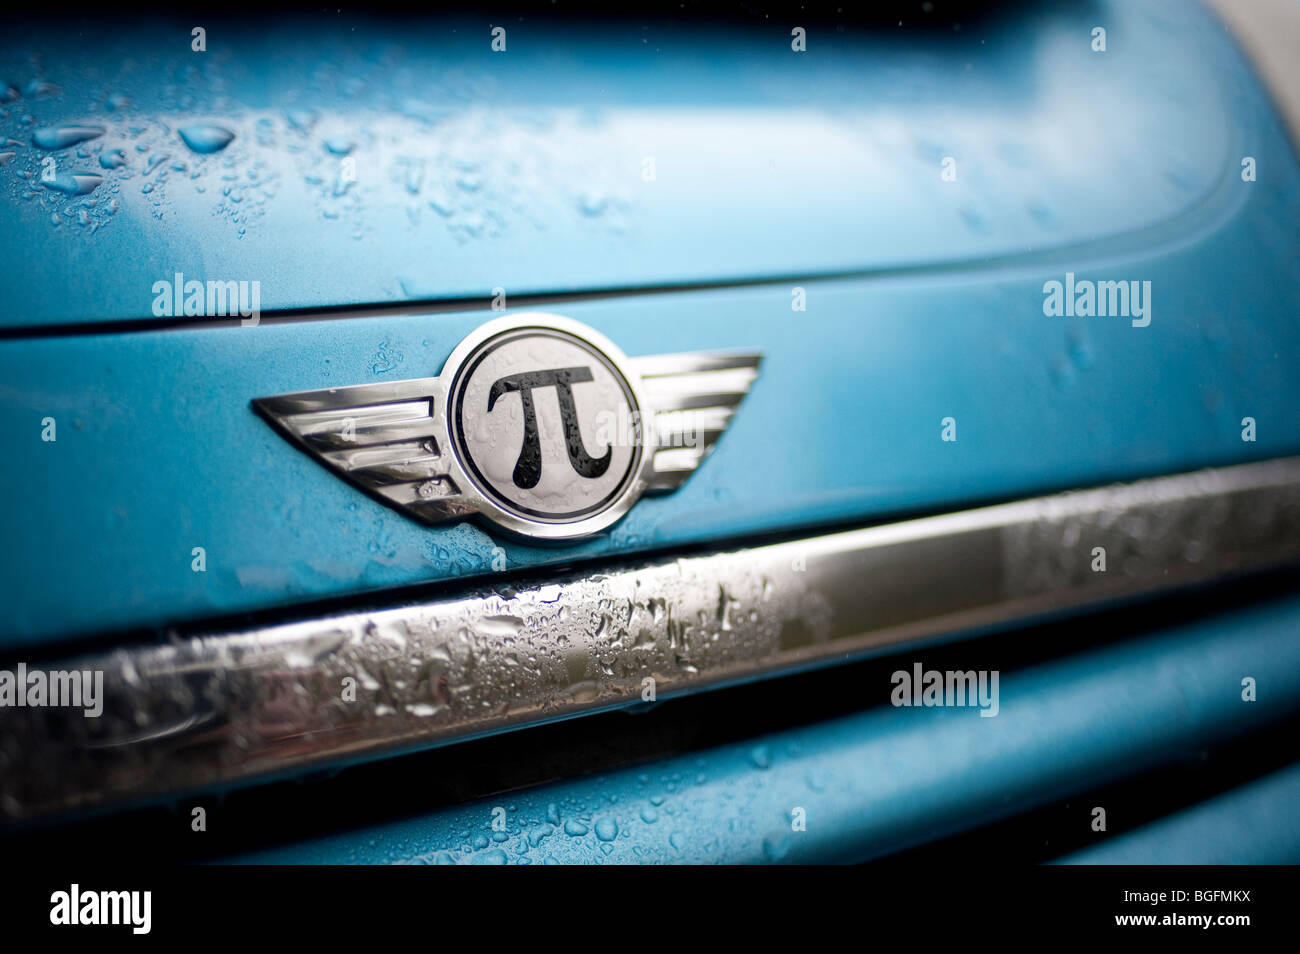 MINI Cooper S with a pi mathematical symbol Stock Photo